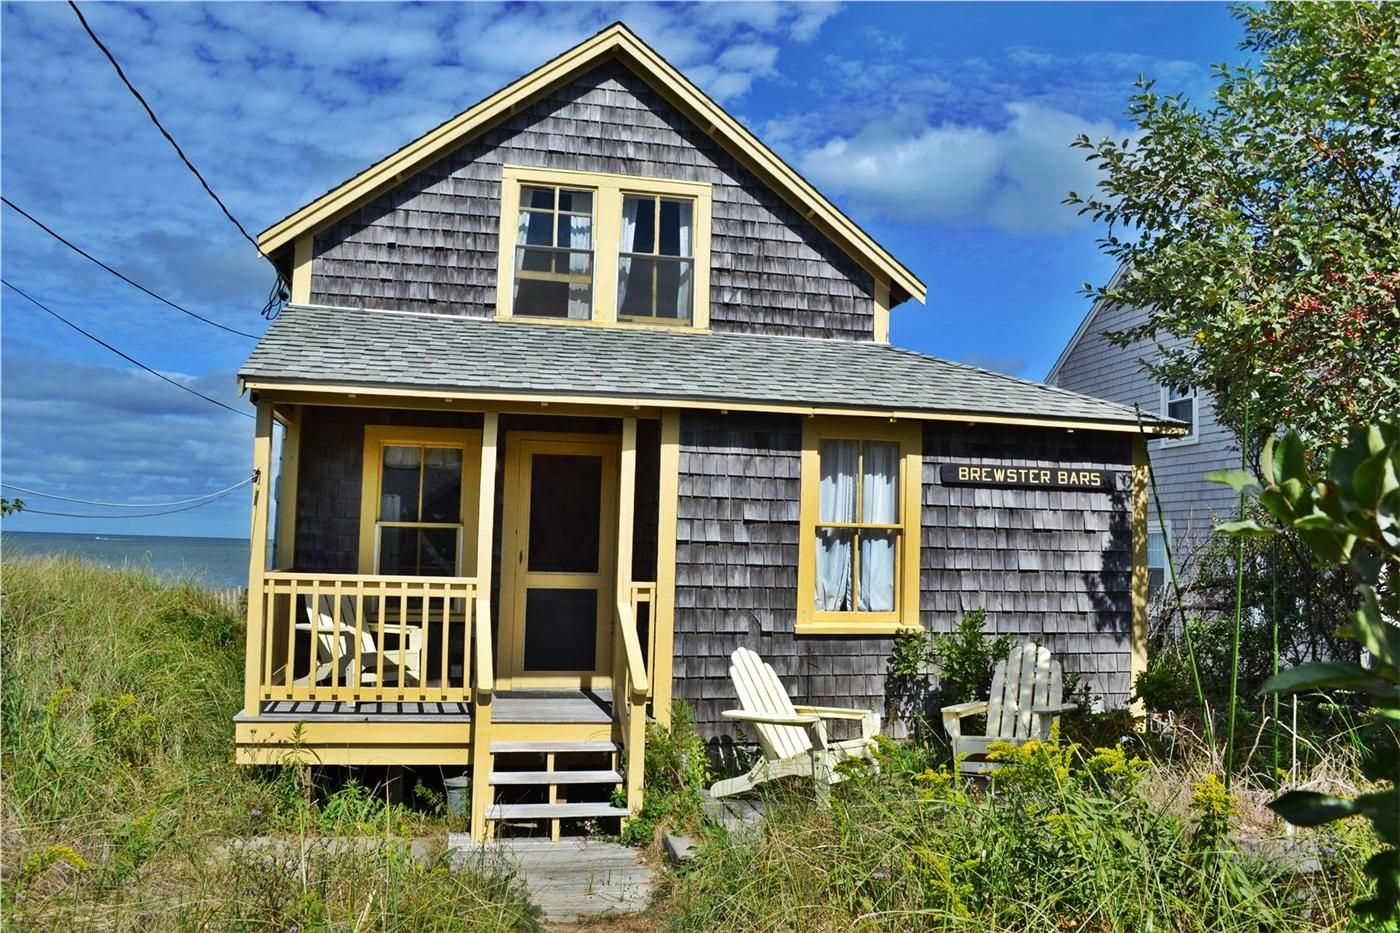 Remarkable Cape Cod Beachfront Cottage Brewster Cape Cod Coastal Download Free Architecture Designs Scobabritishbridgeorg